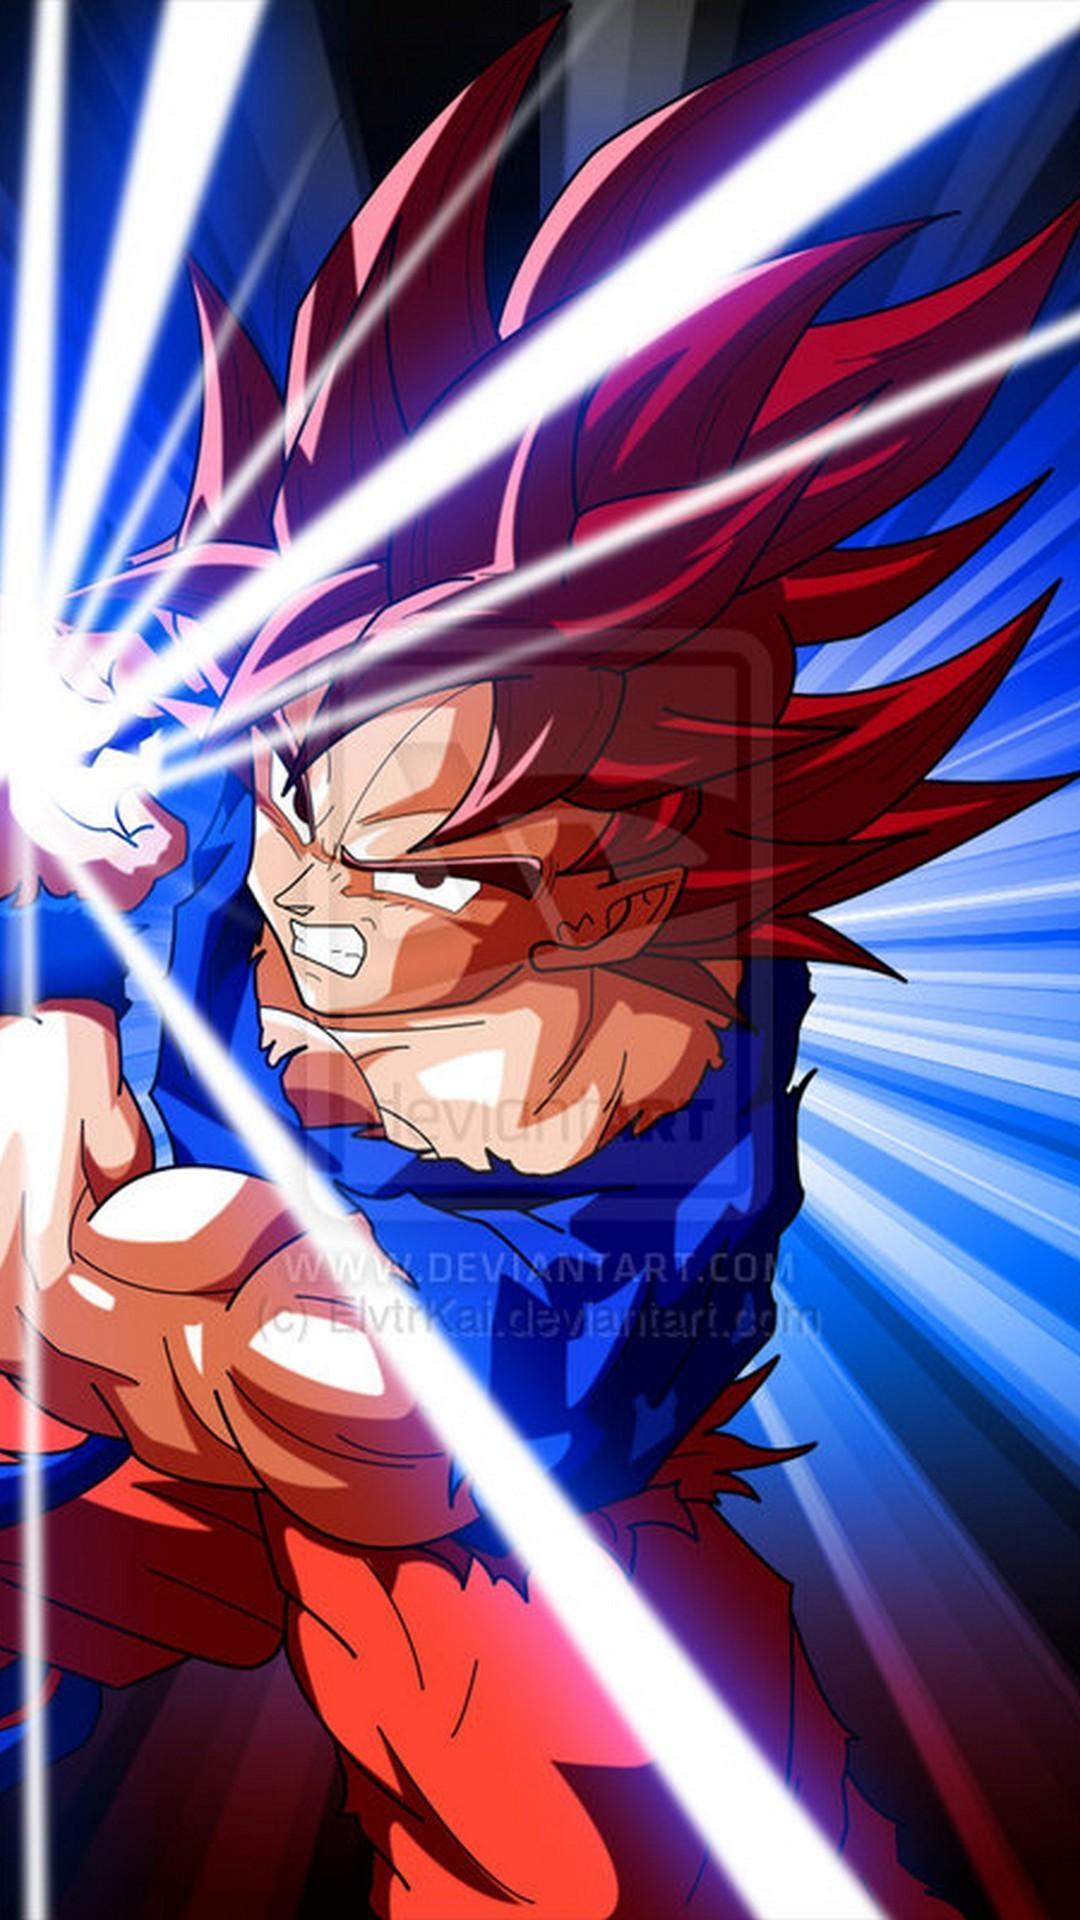 Iphone Wallpaper Goku Super Saiyan God With Image Resolution Kamehameha Goku Super Saiyan 4 1080x1920 Download Hd Wallpaper Wallpapertip